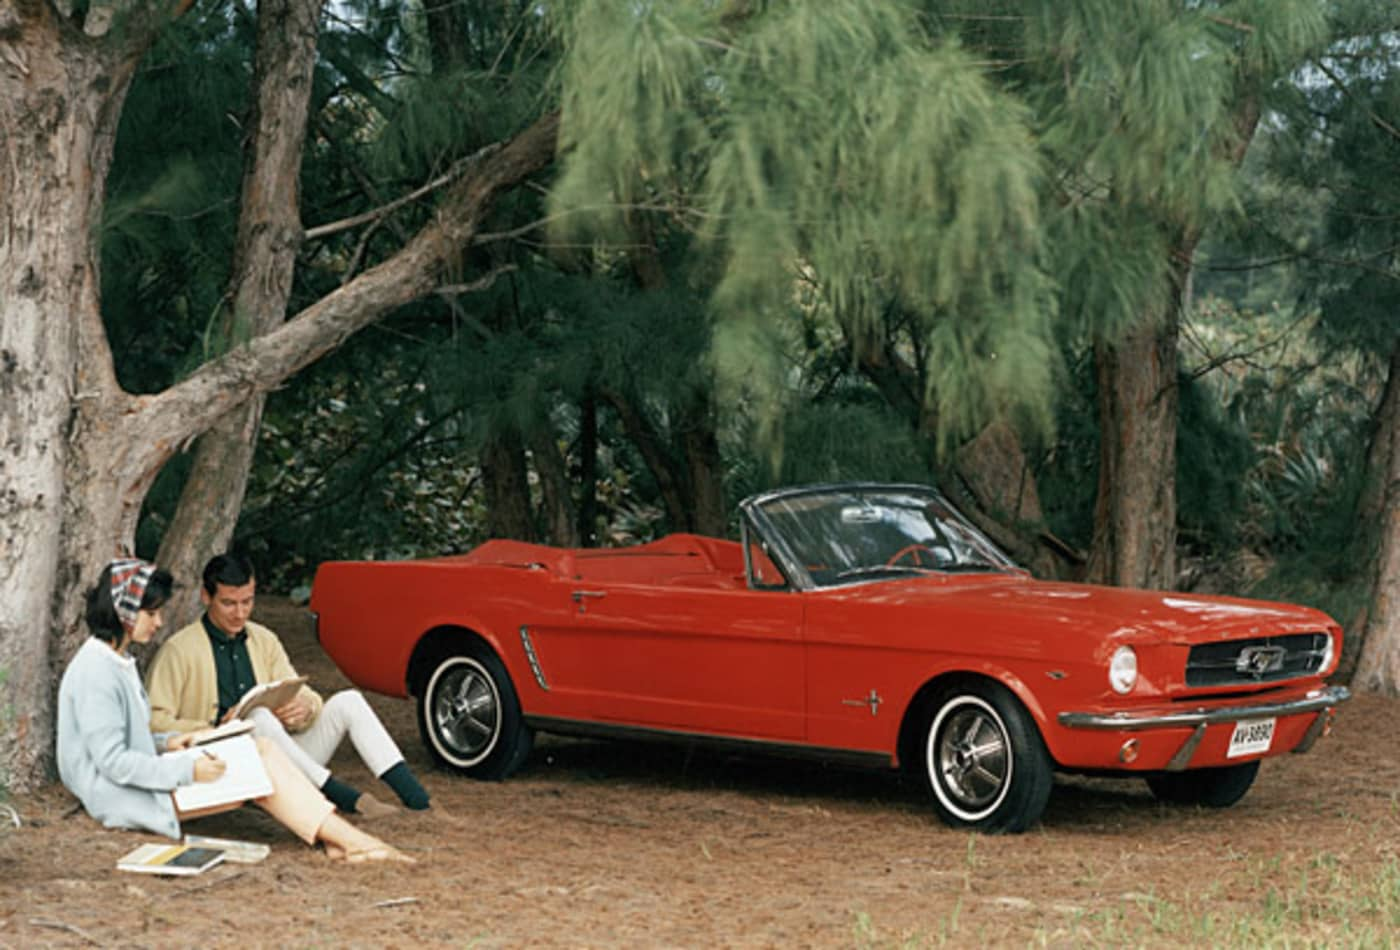 iacocca_cars_mustang_1964.jpg